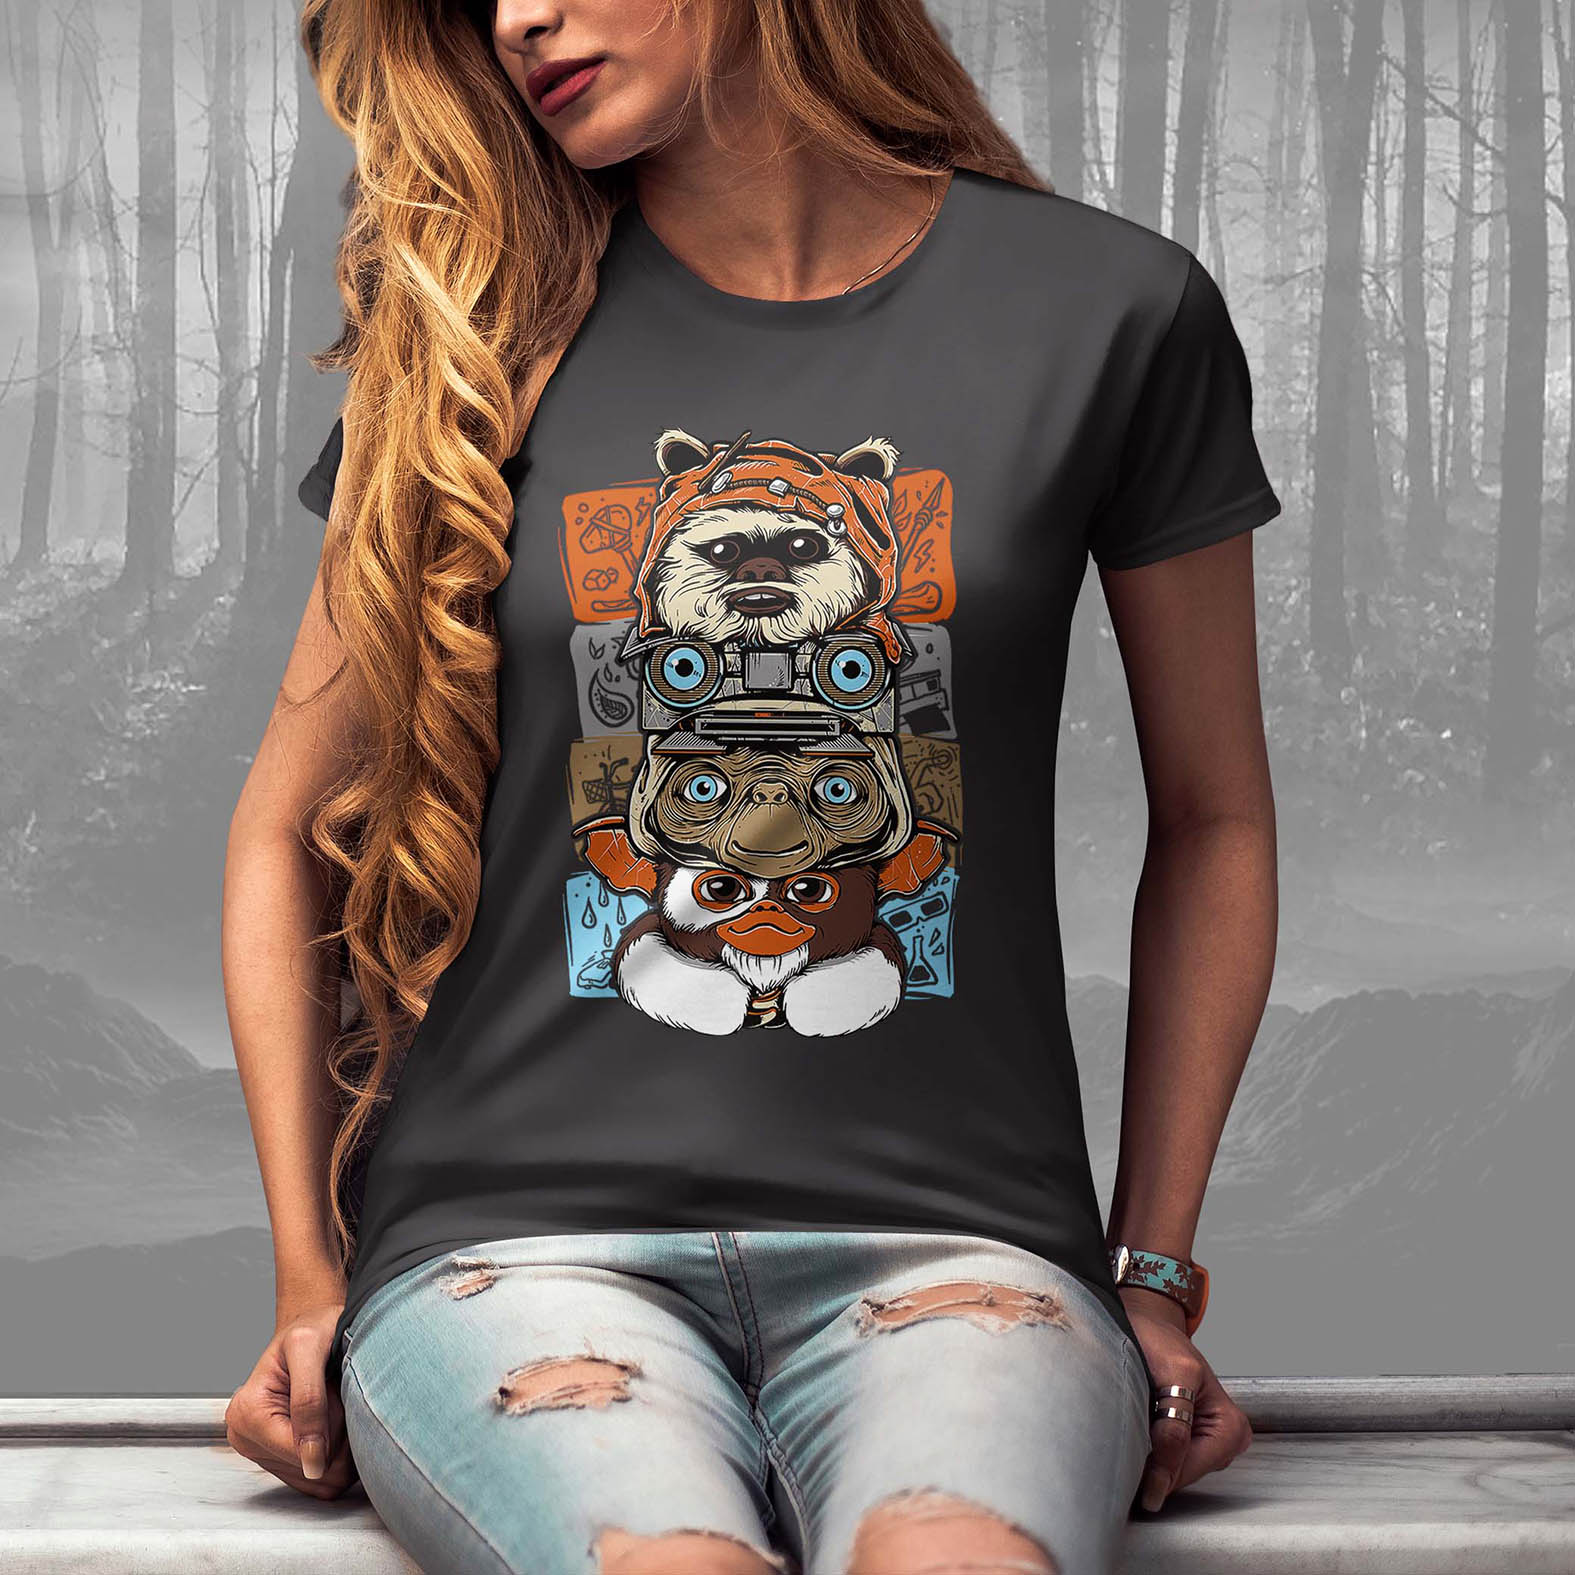 Camiseta Feminina Unissex Ewoks Johnny Five Et Extraterrestre Mogwai Gremlins Monsters Horror (Cinza Chumbo) - EV